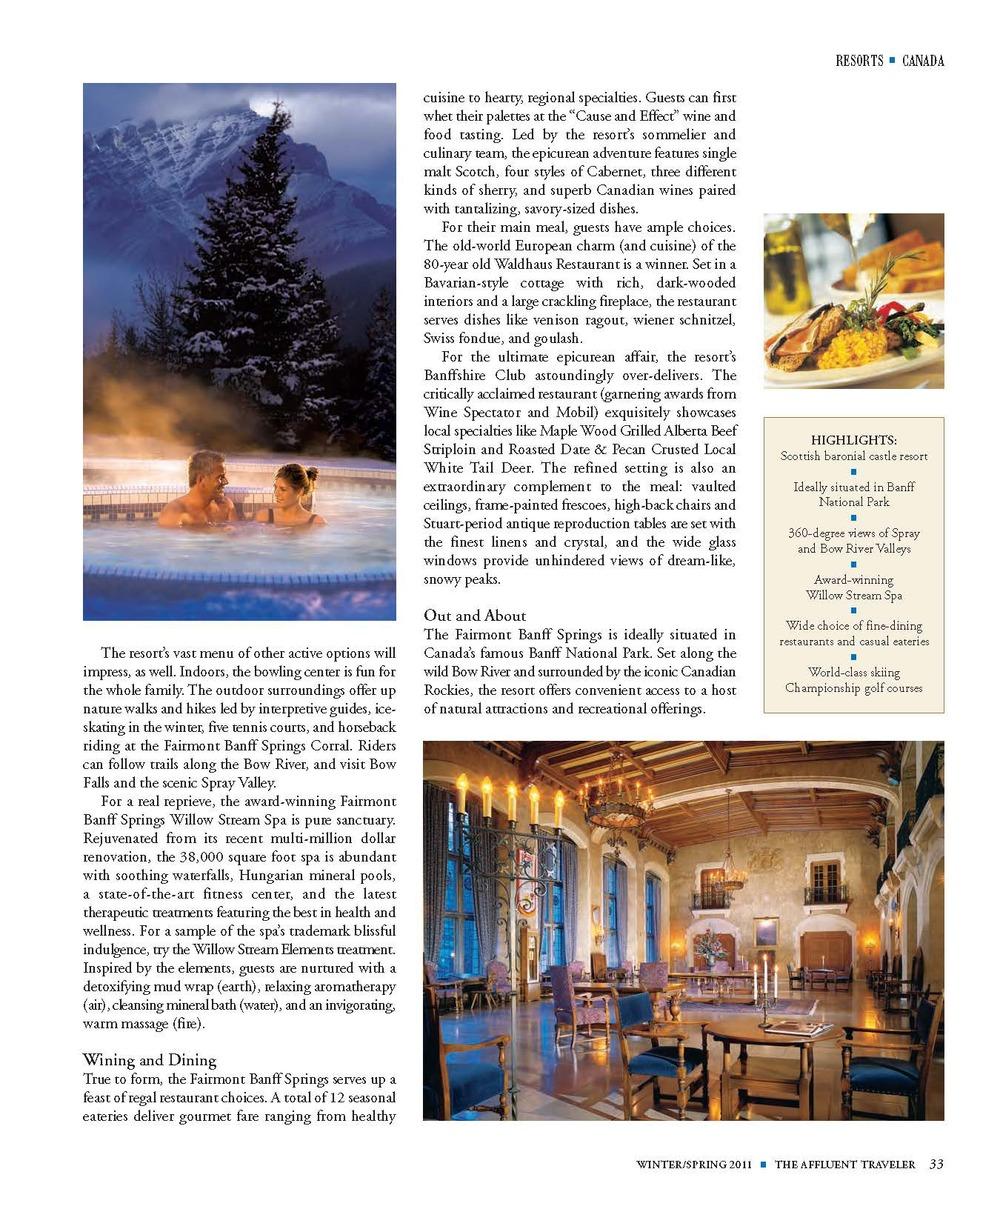 tat_winter_spring_Page_25.jpg